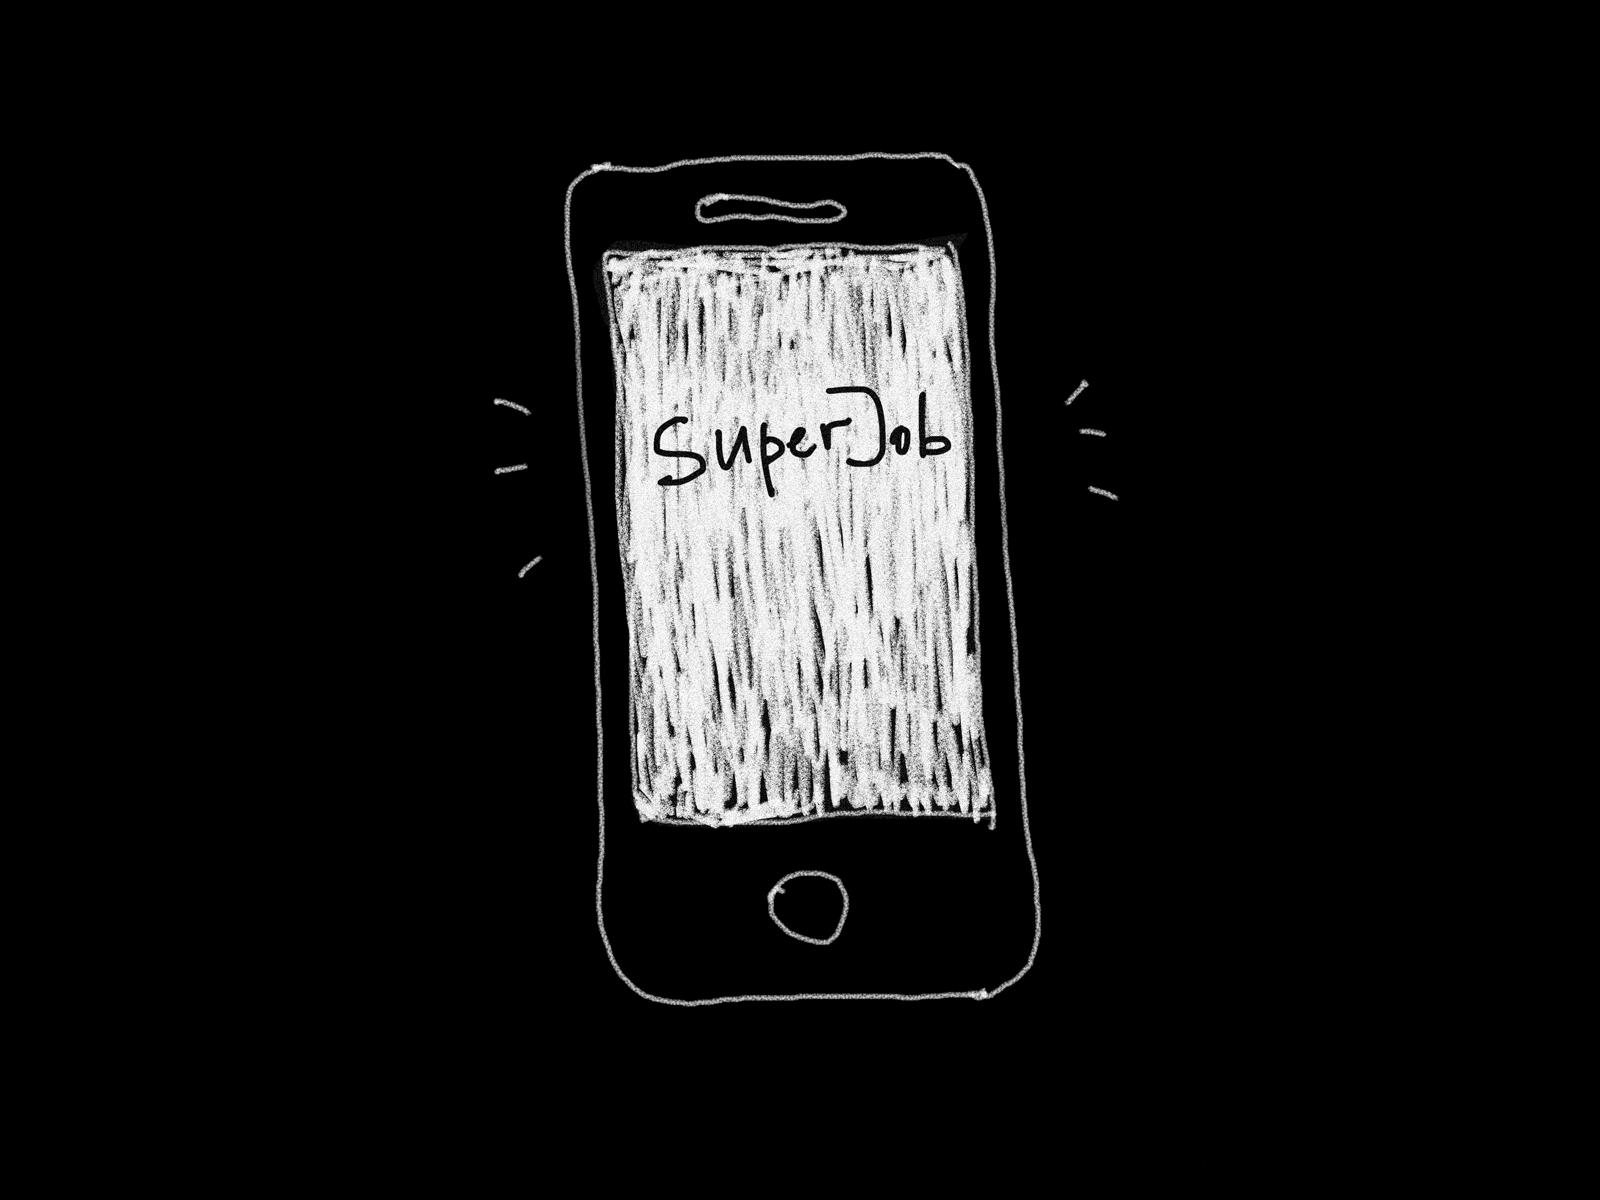 IT-meetup Superjob «iOS — архитектура дизайна, кода, деплоя» (отчет, презентации, видео) - 1